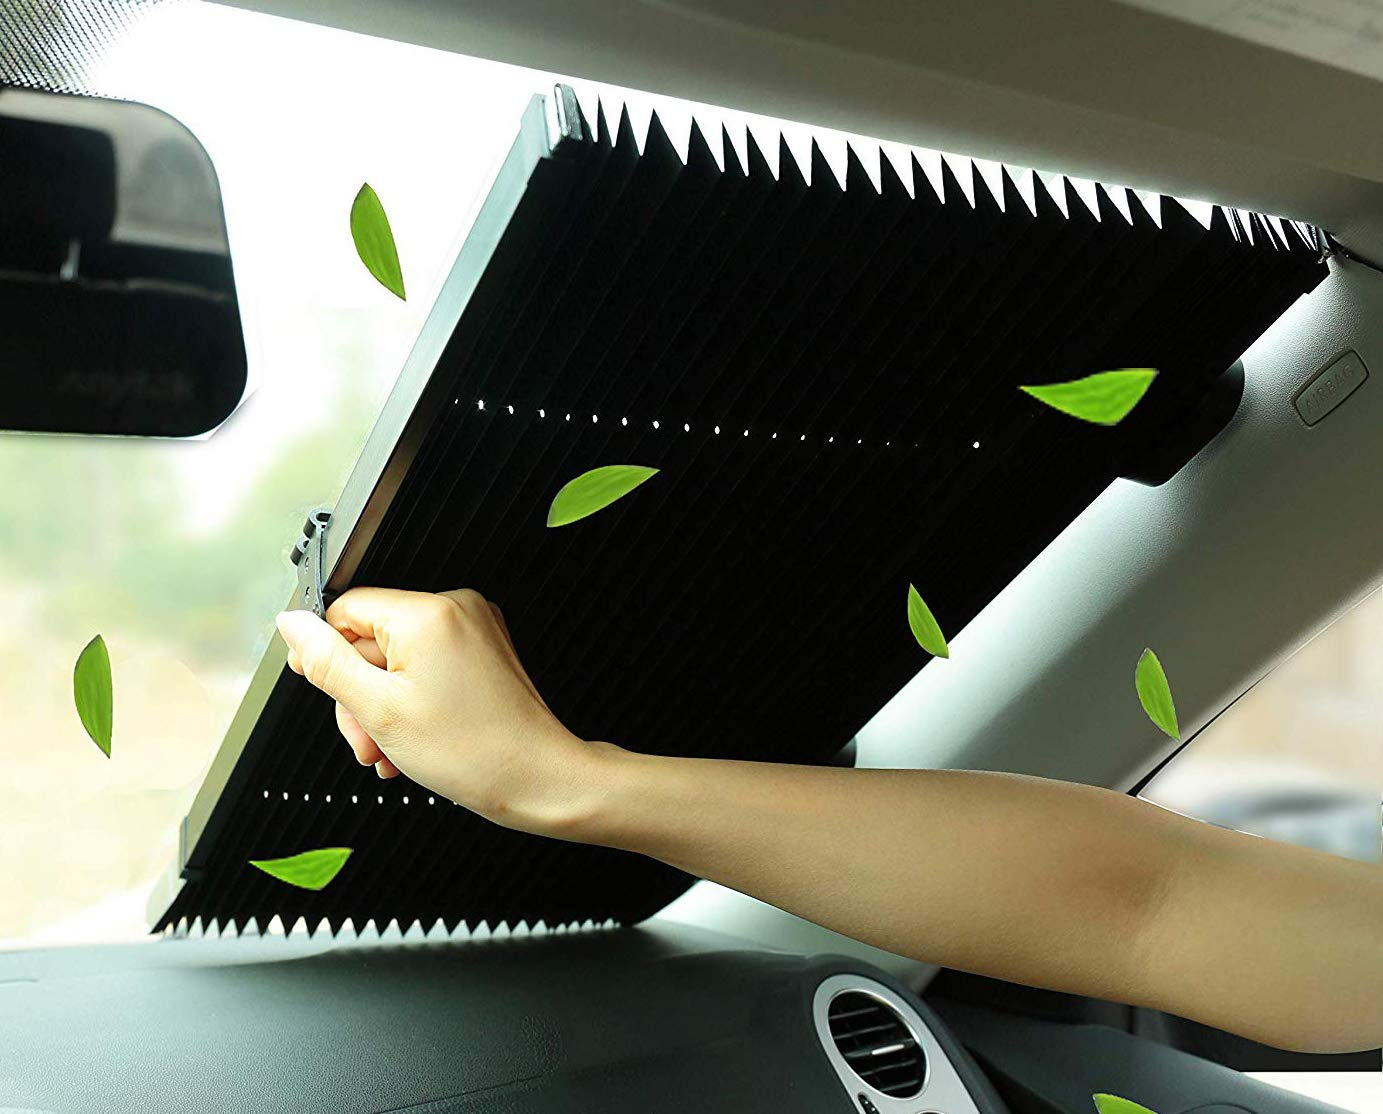 Marvellous/Car Windshield Sun Shade,Accordion Style Retractable Sun Shade,Front Window UV Heat Insulation Universal Car Sun Shades Keep Your Vehicle Cool